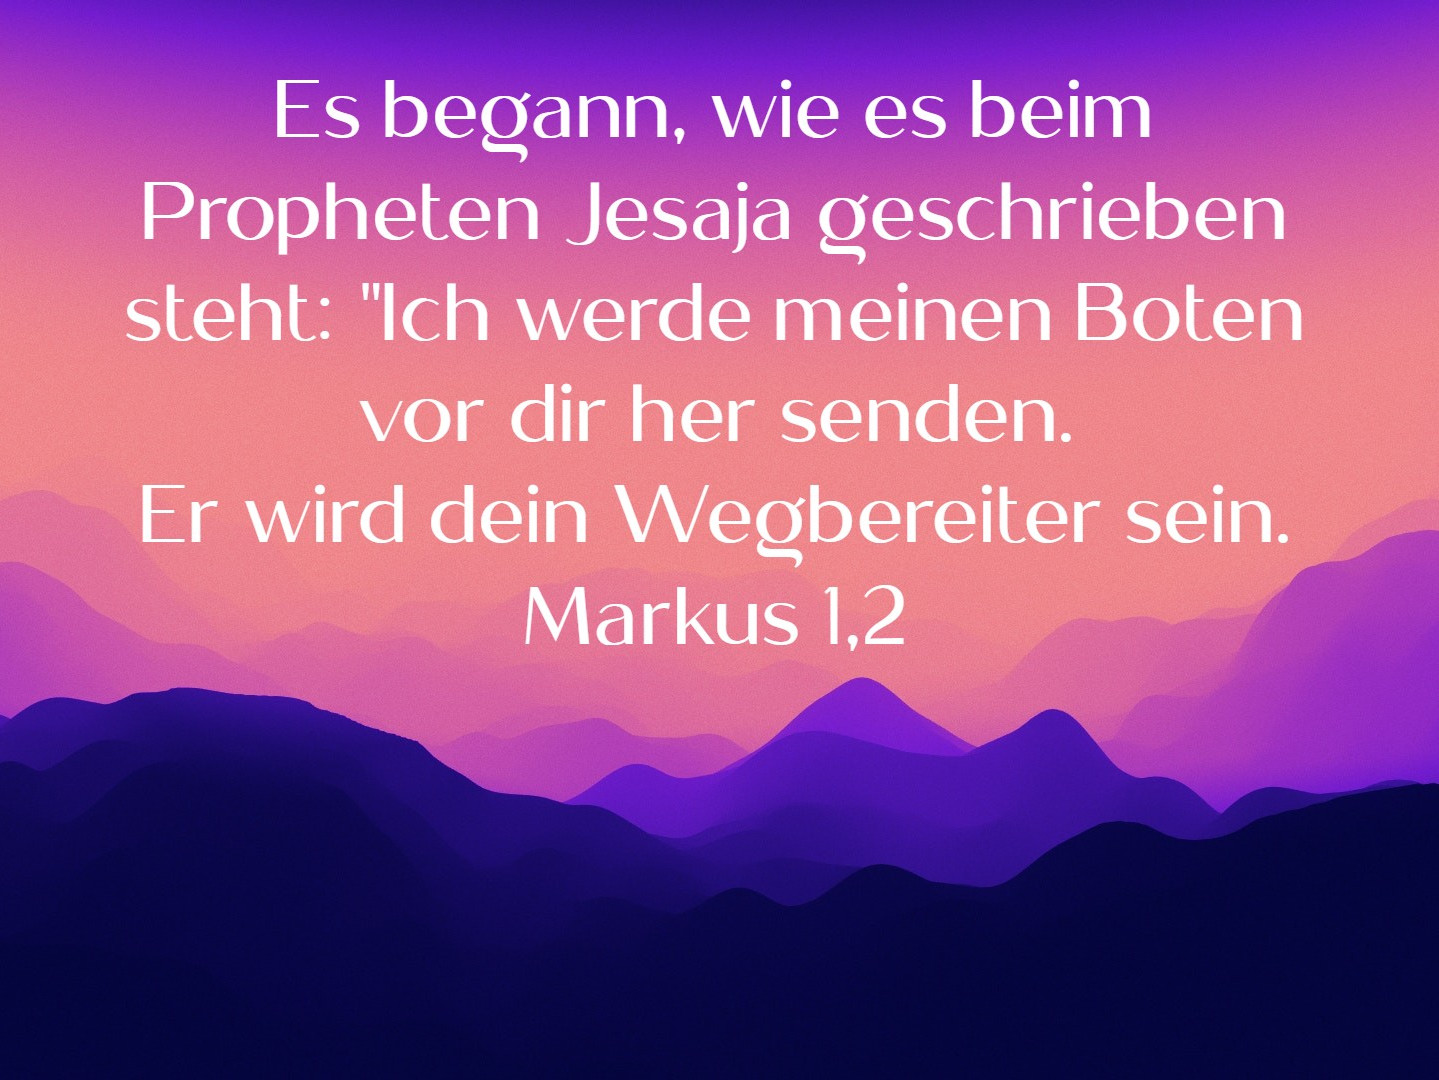 Markus 1,2a.jpeg